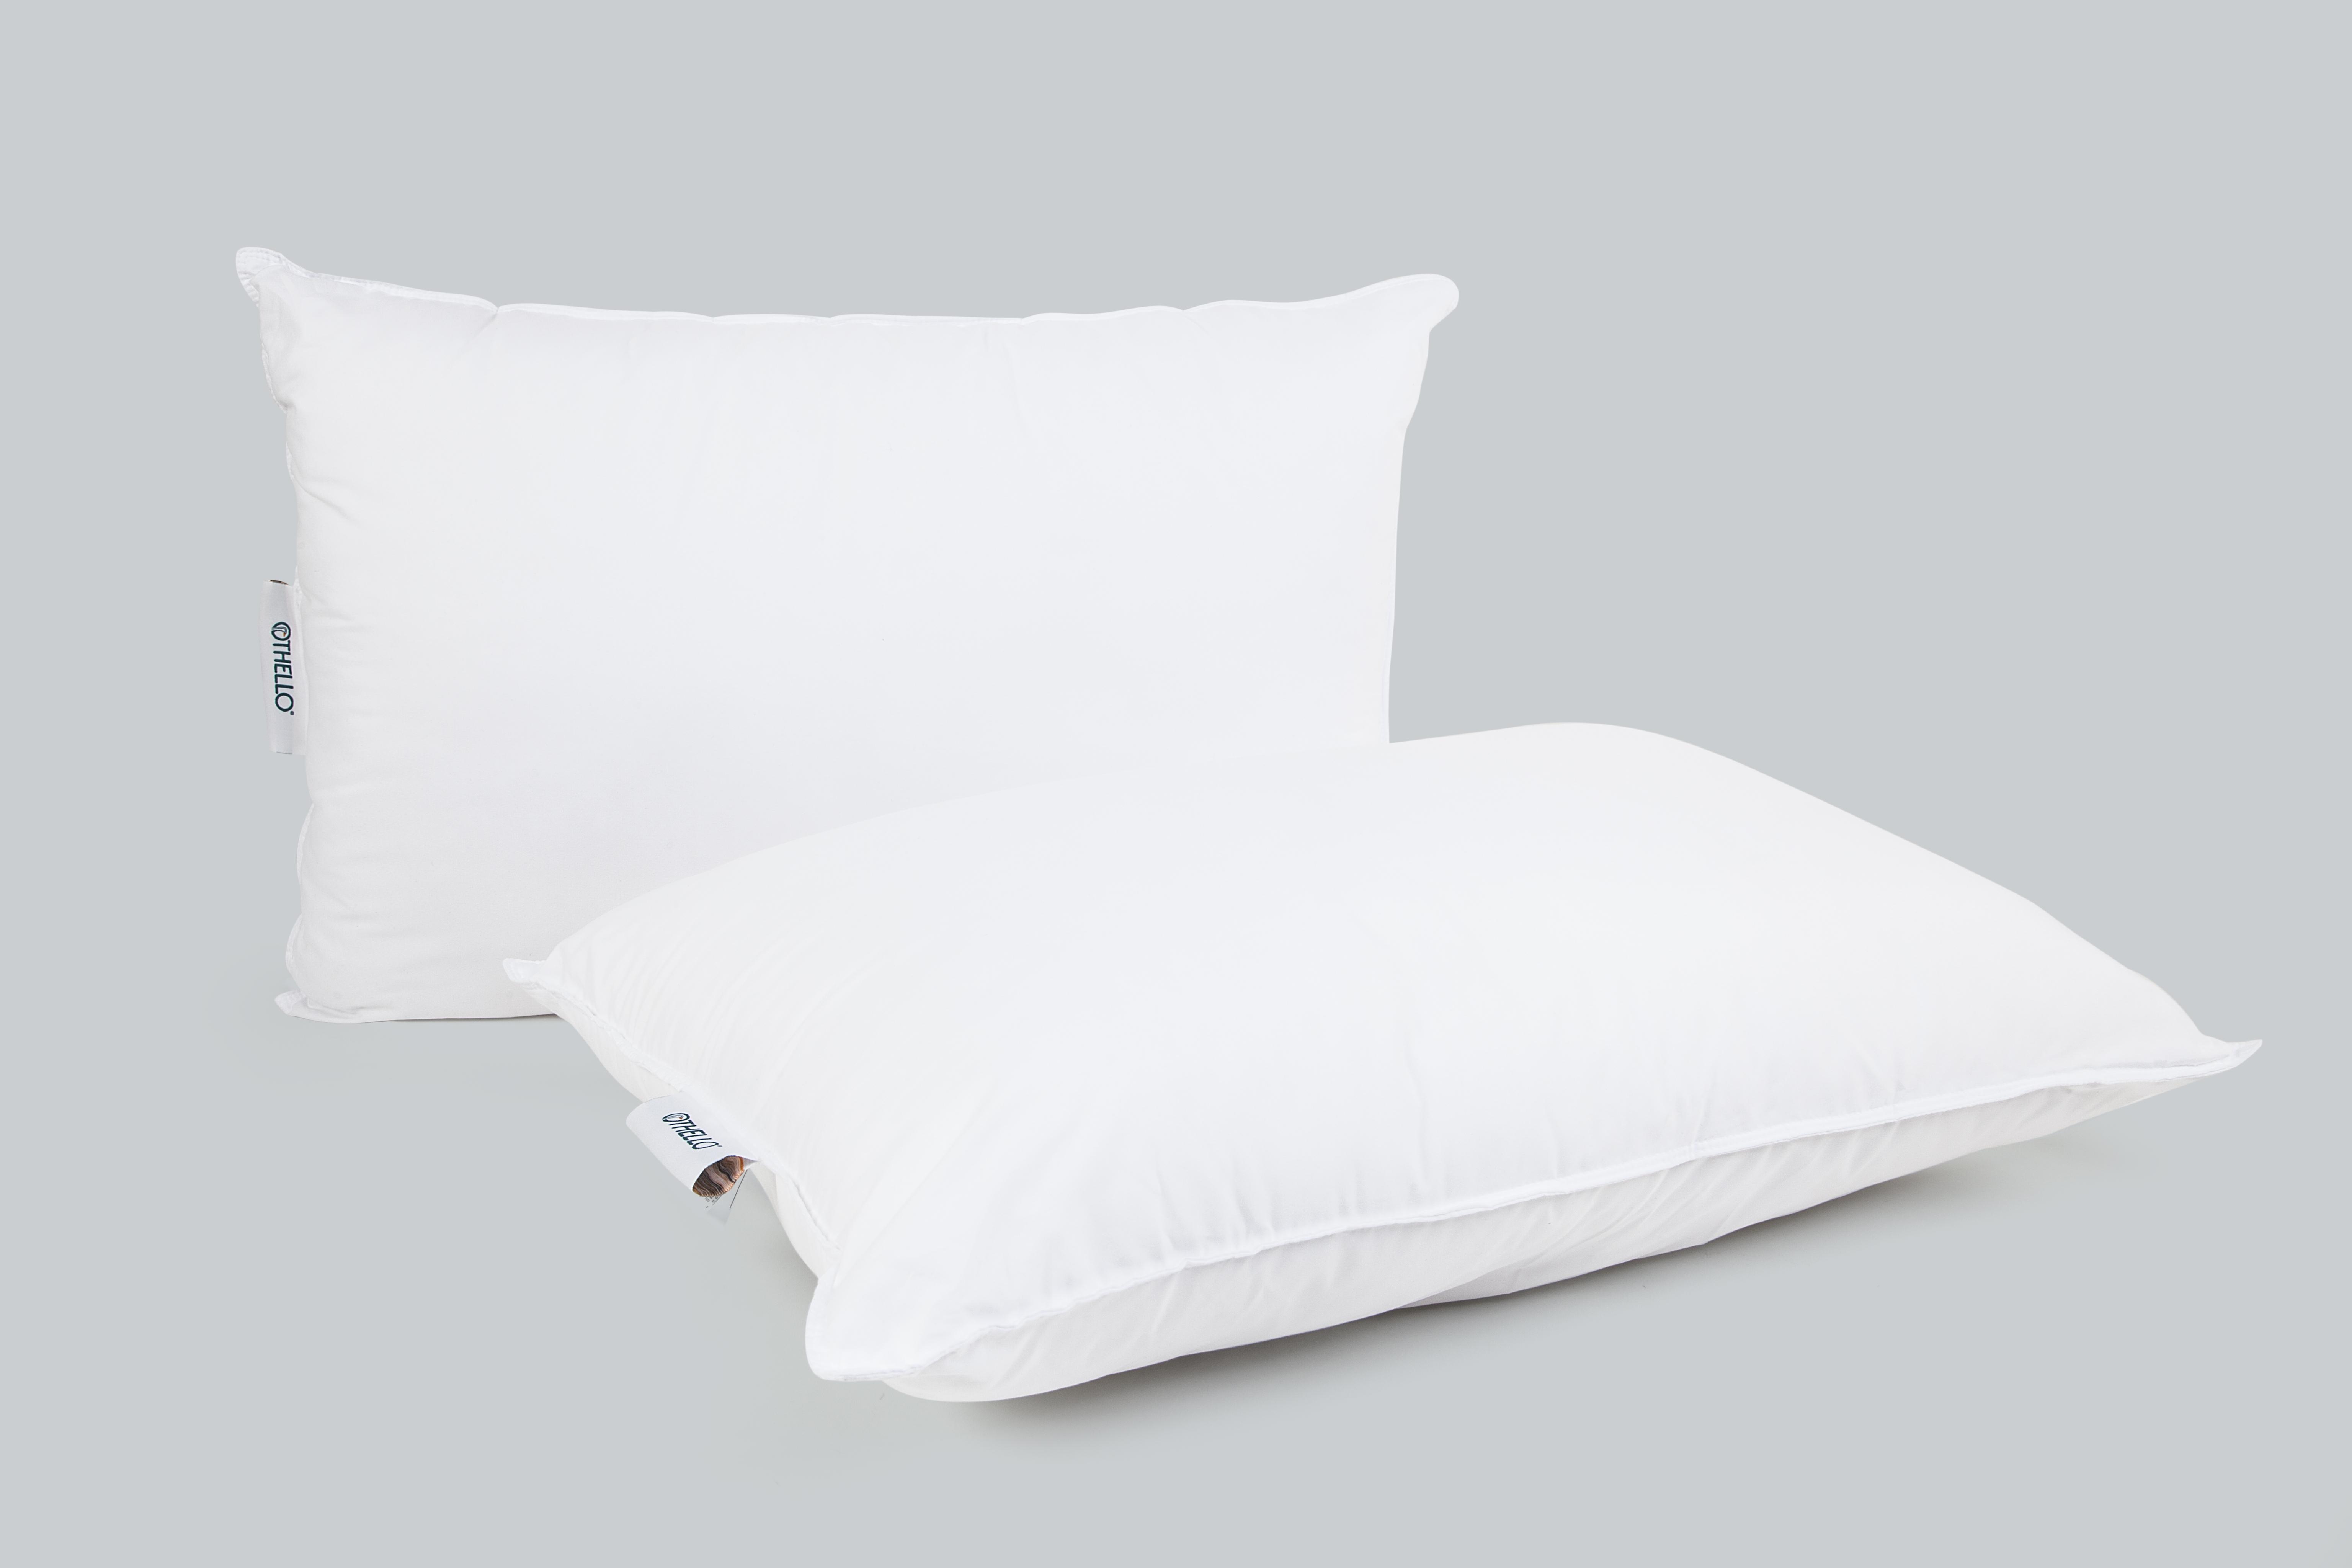 Othello Mıcra Elyaf 50*70 cm Yastık